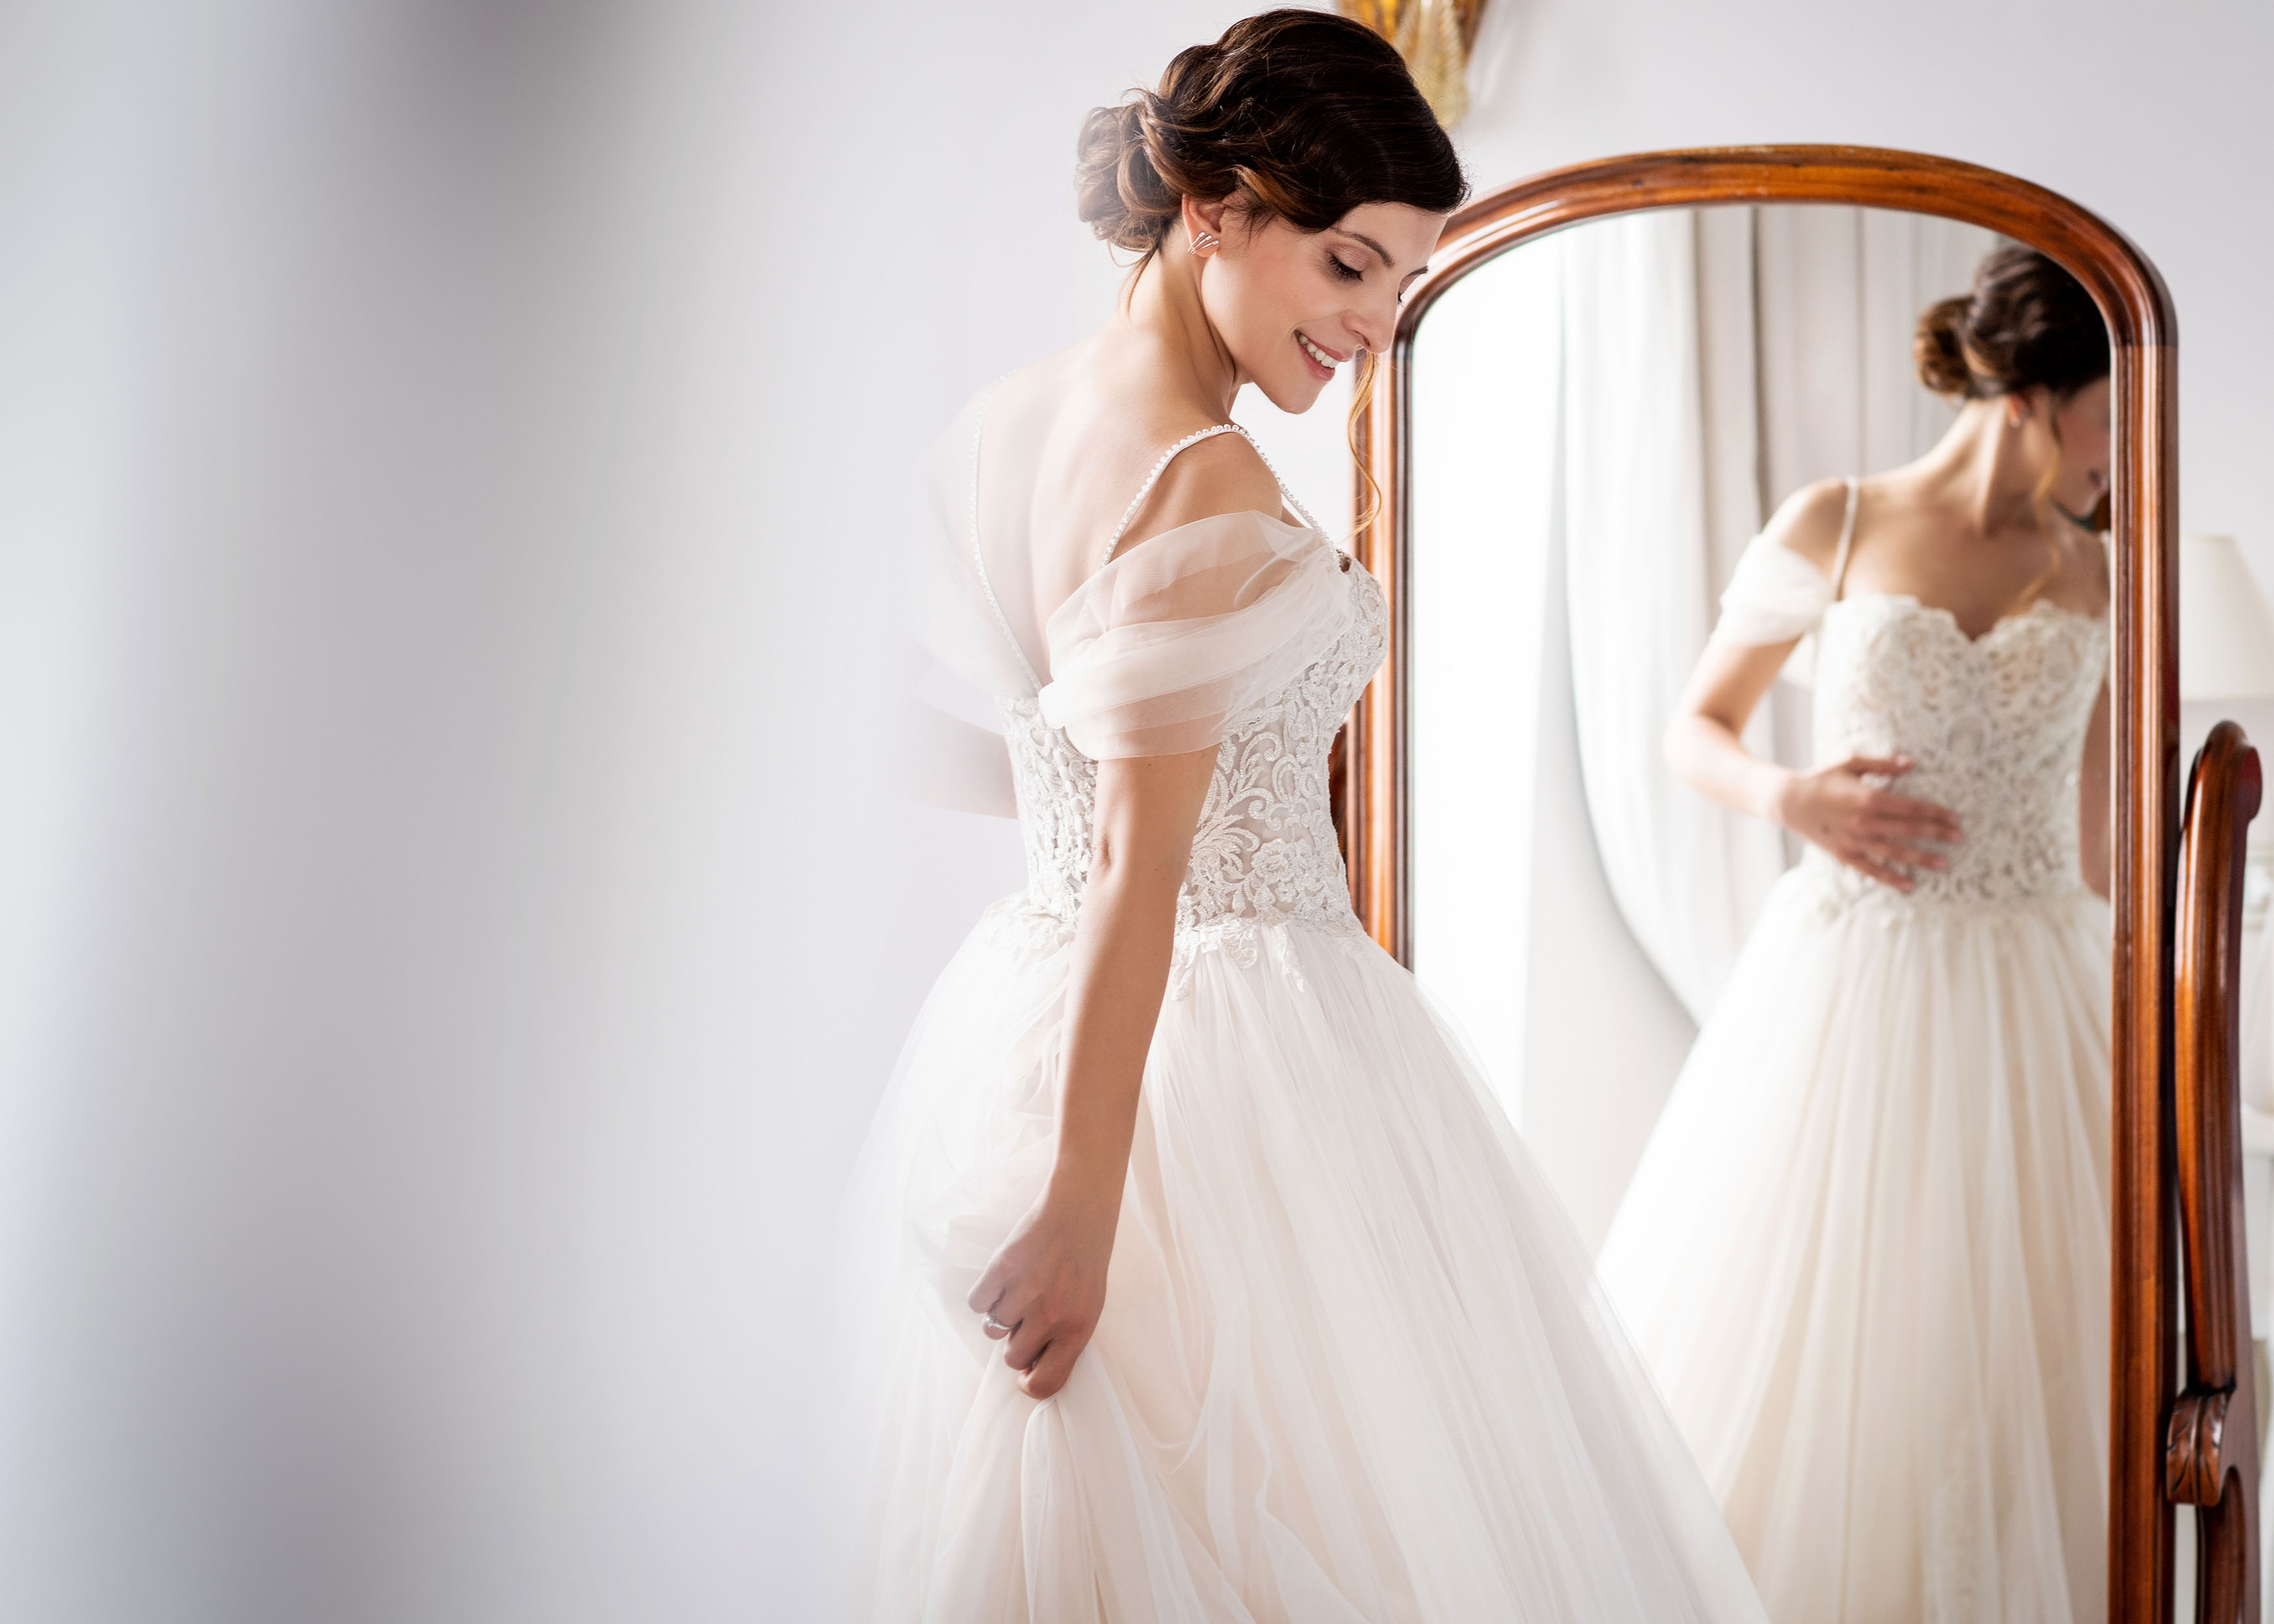 http://www.weddingamalfi.com/wp-content/uploads/Katia-Jorge-18-maggio-2019-15.jpg